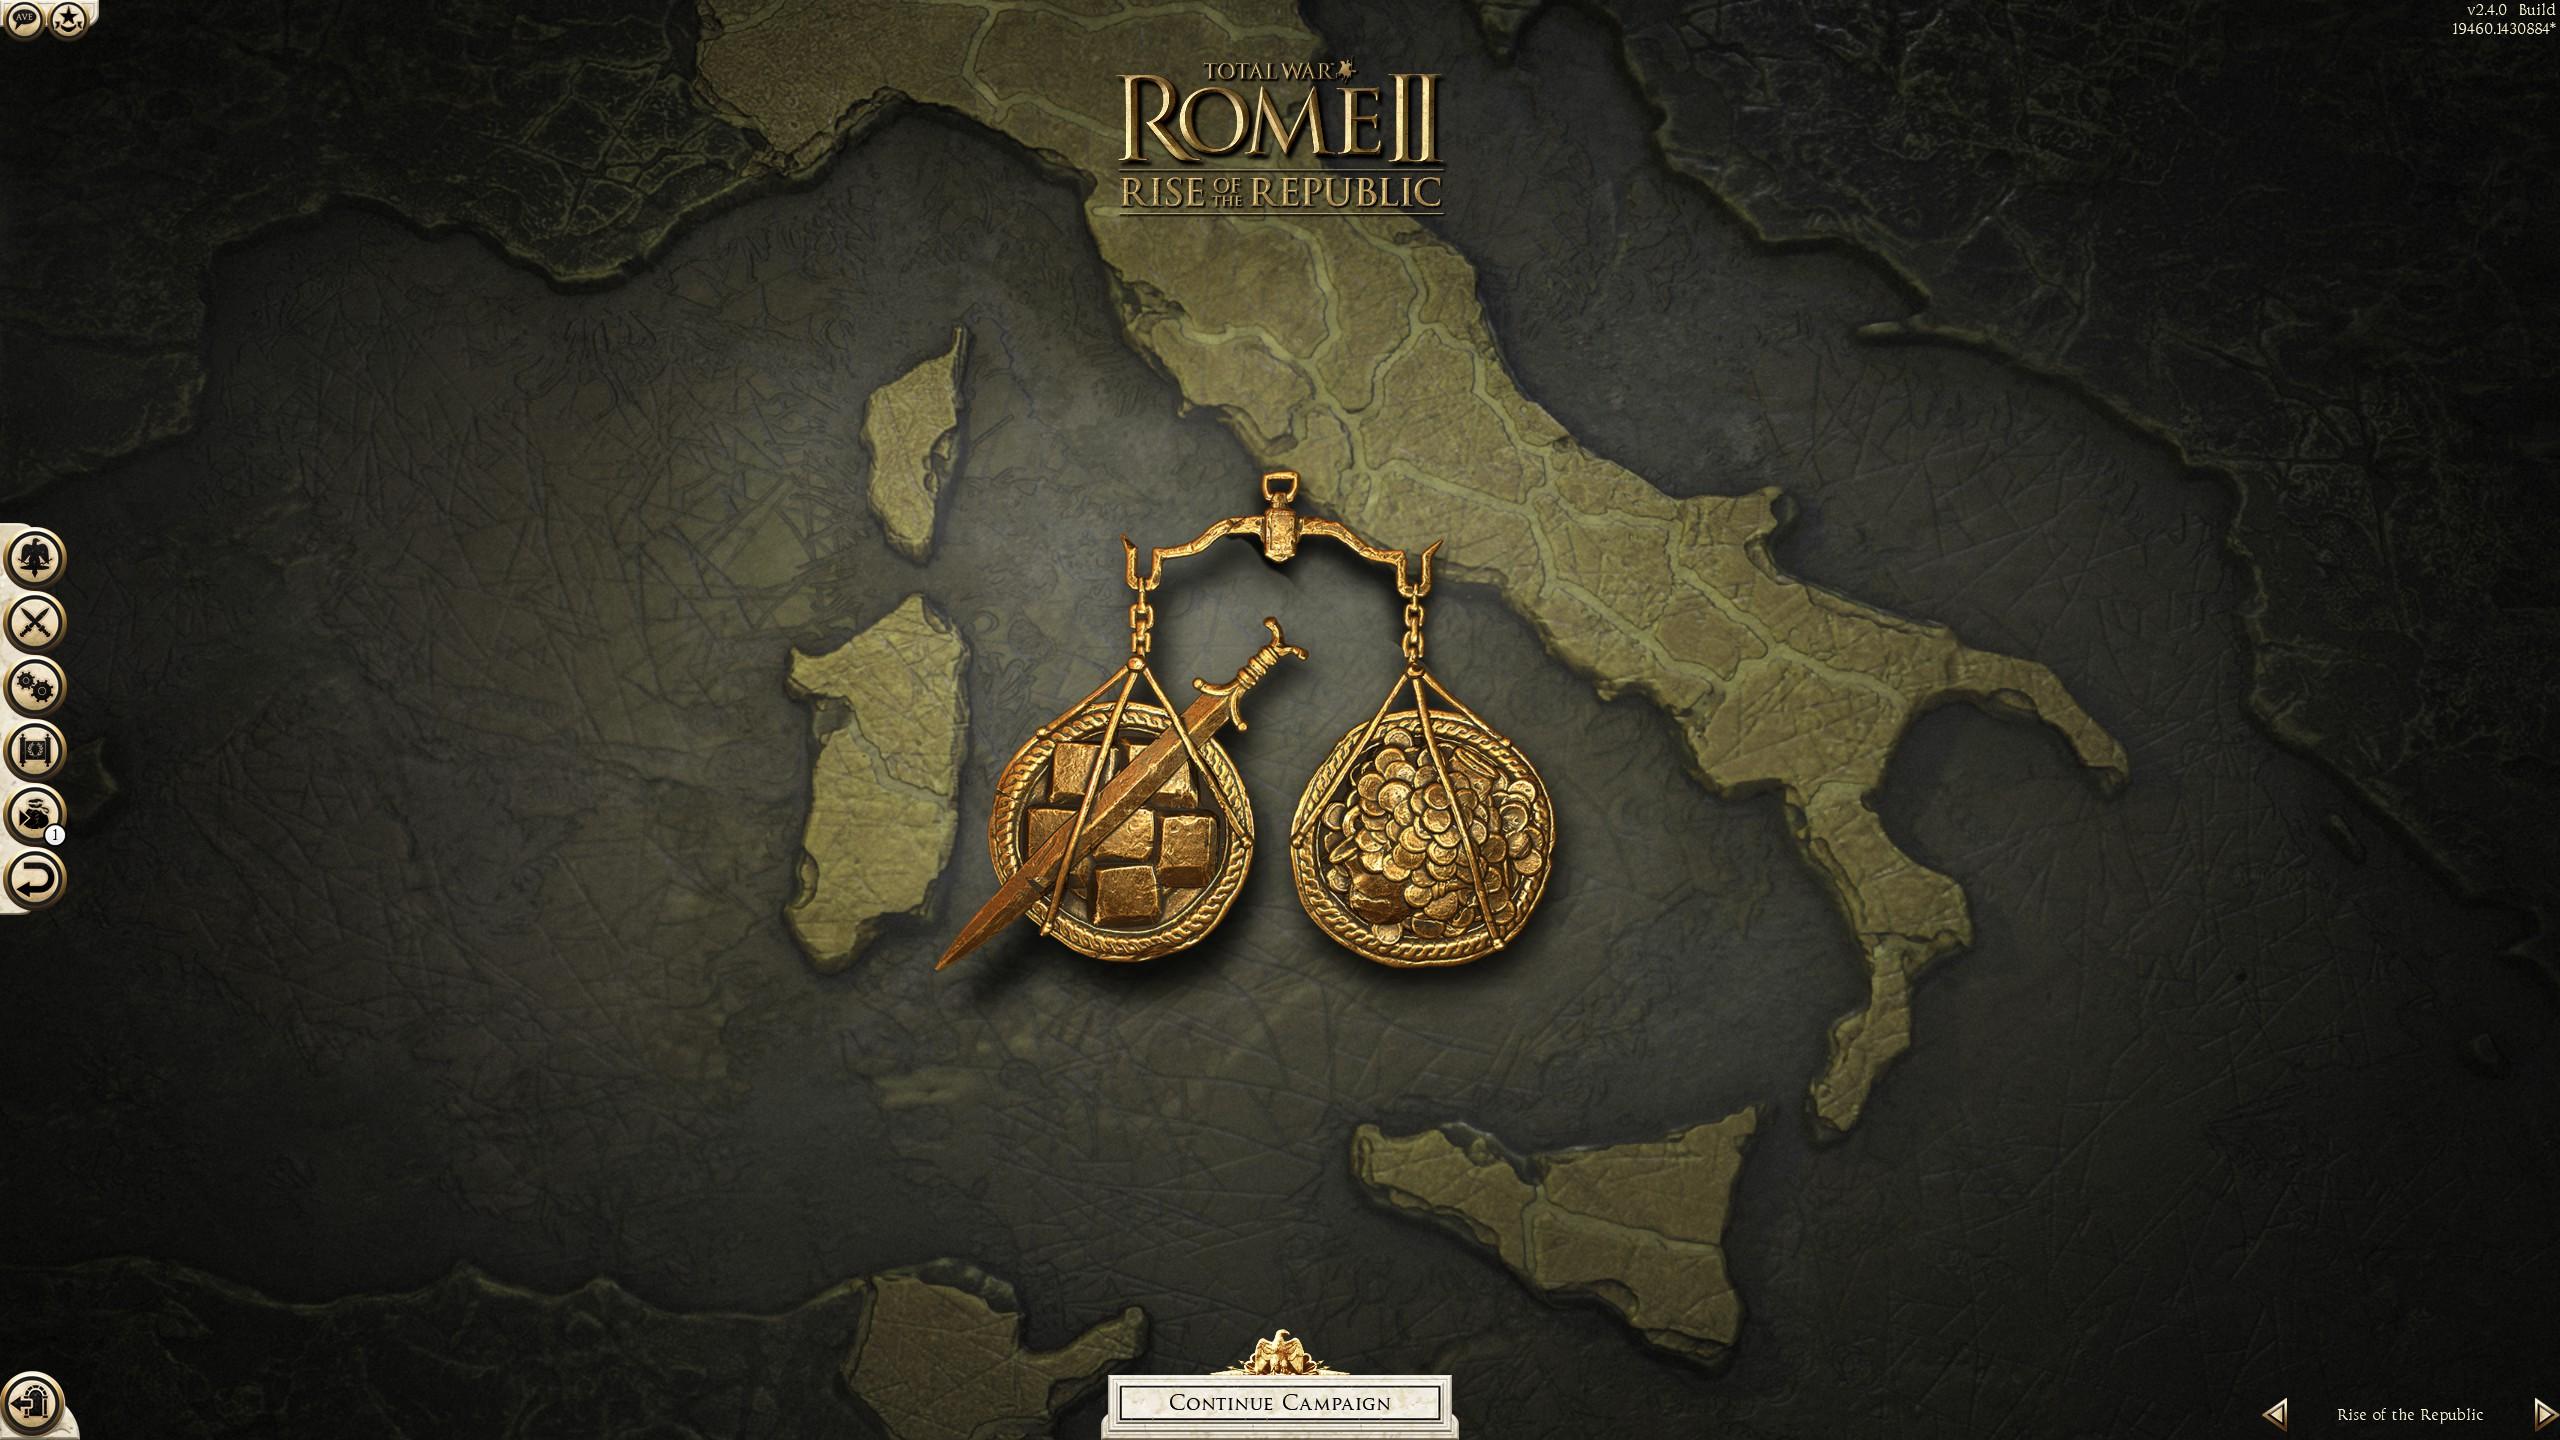 Total War Rome Ii Rise Of The Republic Campaign Pack Gamewatcher